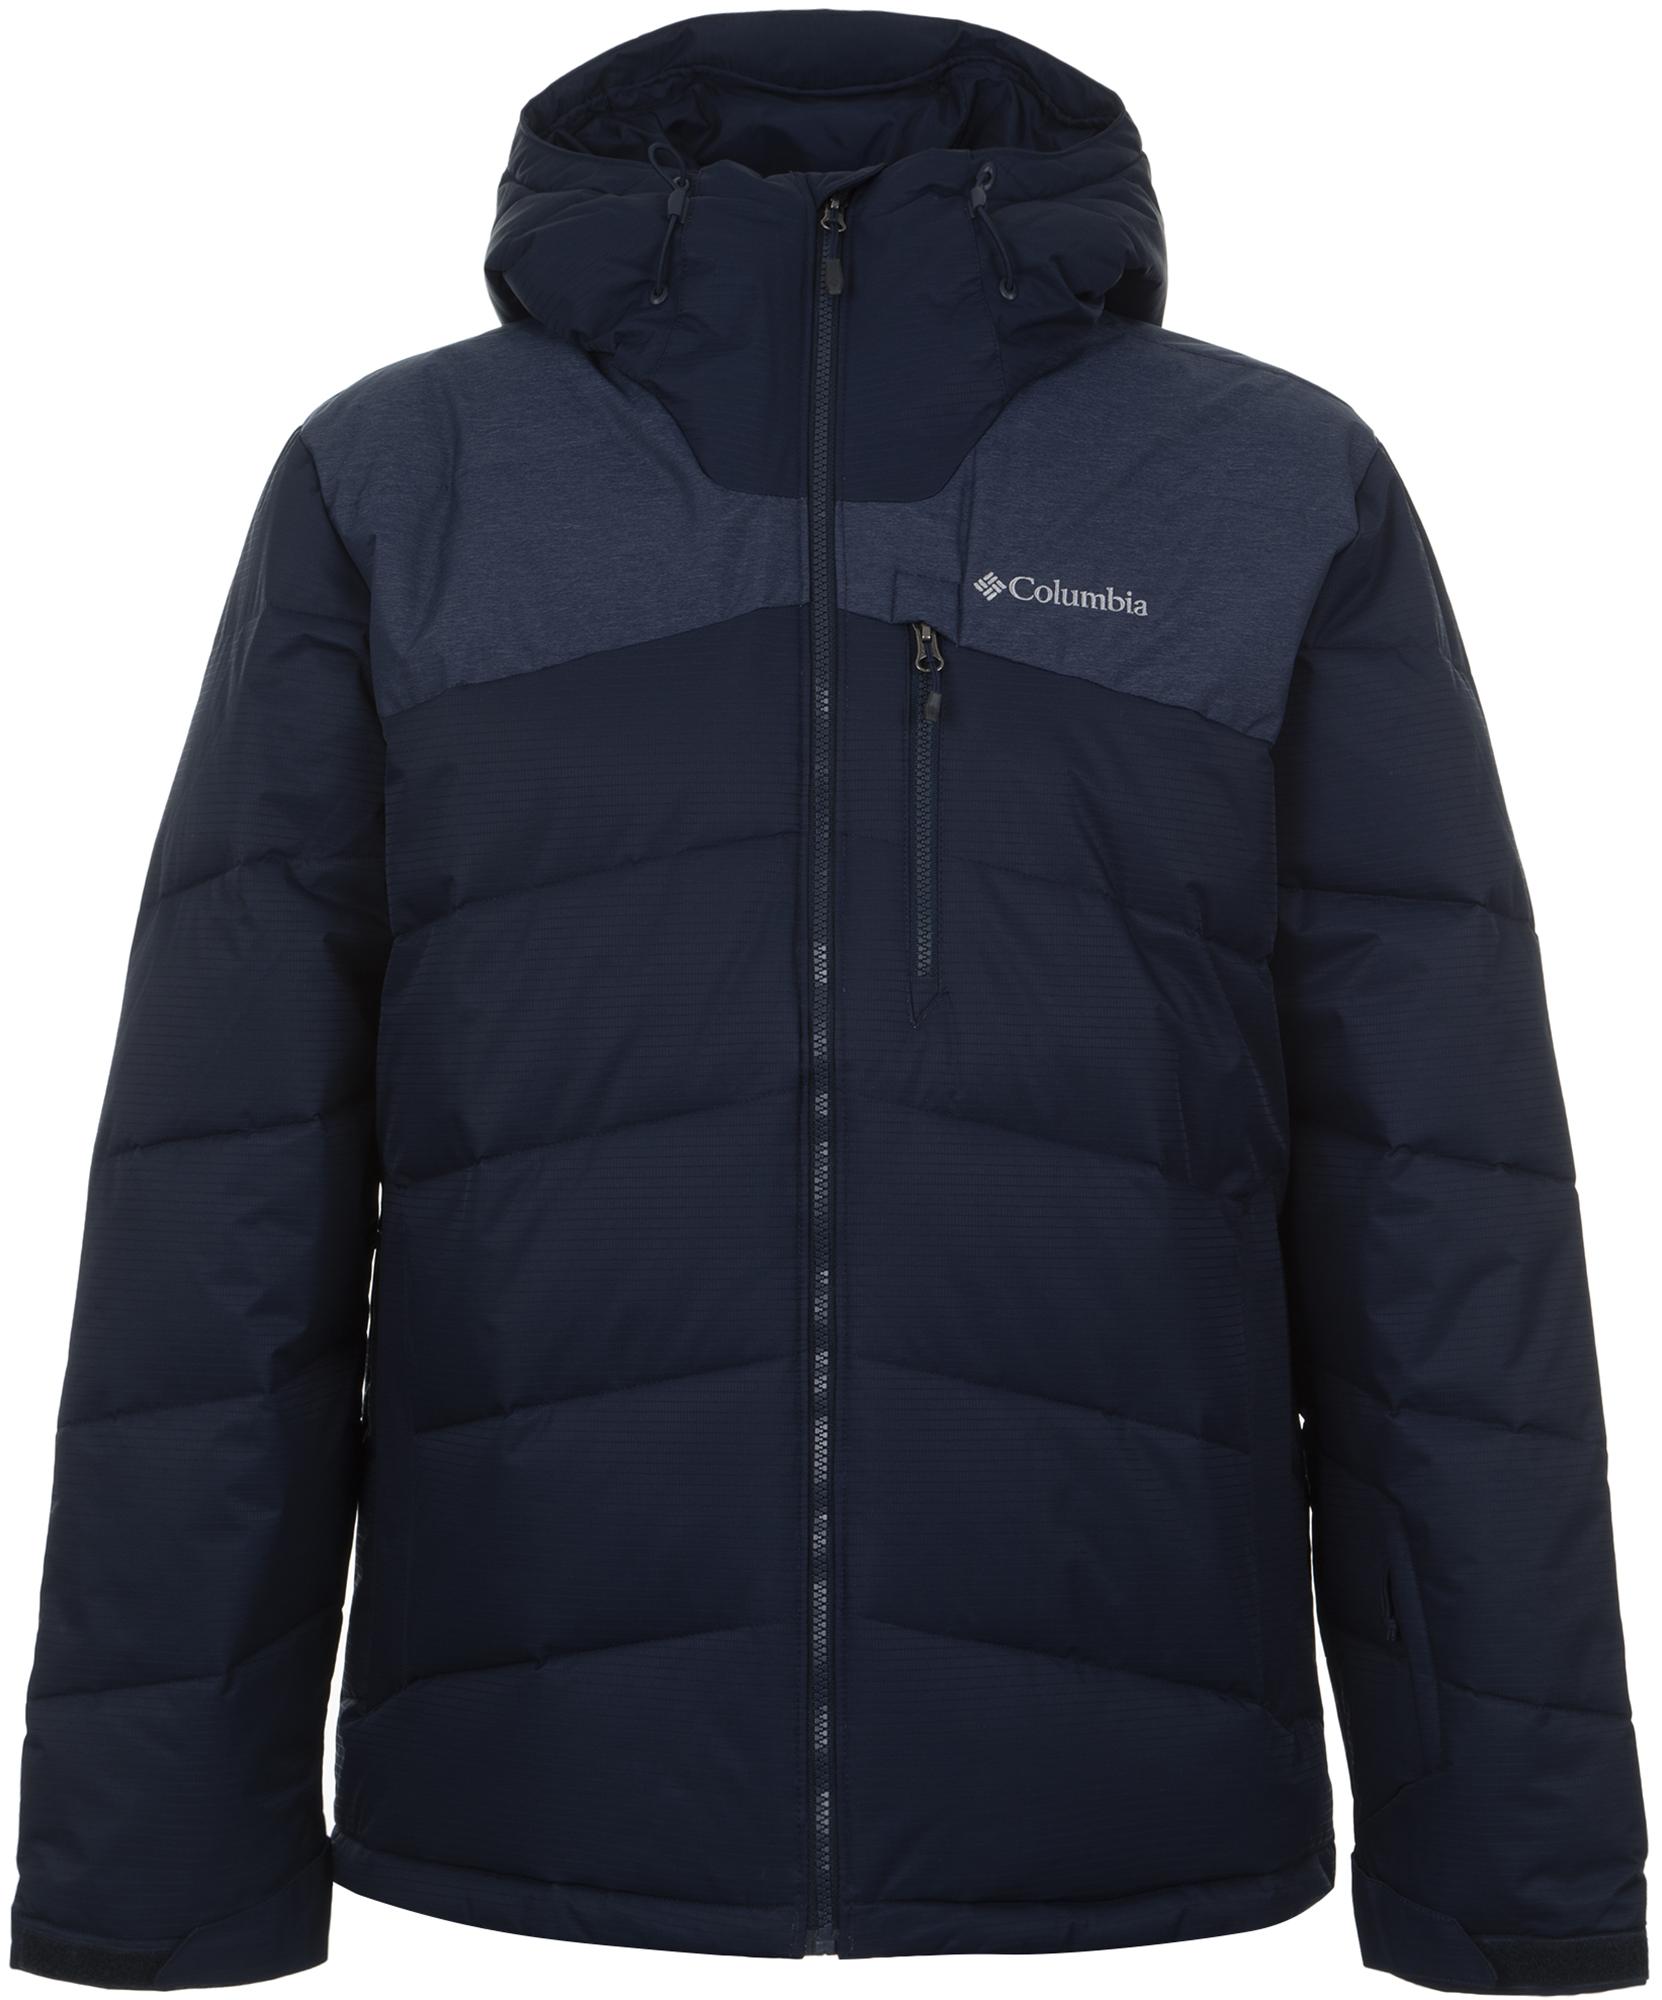 Columbia Куртка утепленная мужская Columbia Woolly Hollow II, размер 48-50 columbia куртка 3 в 1 мужская columbia whirlibird размер 48 50